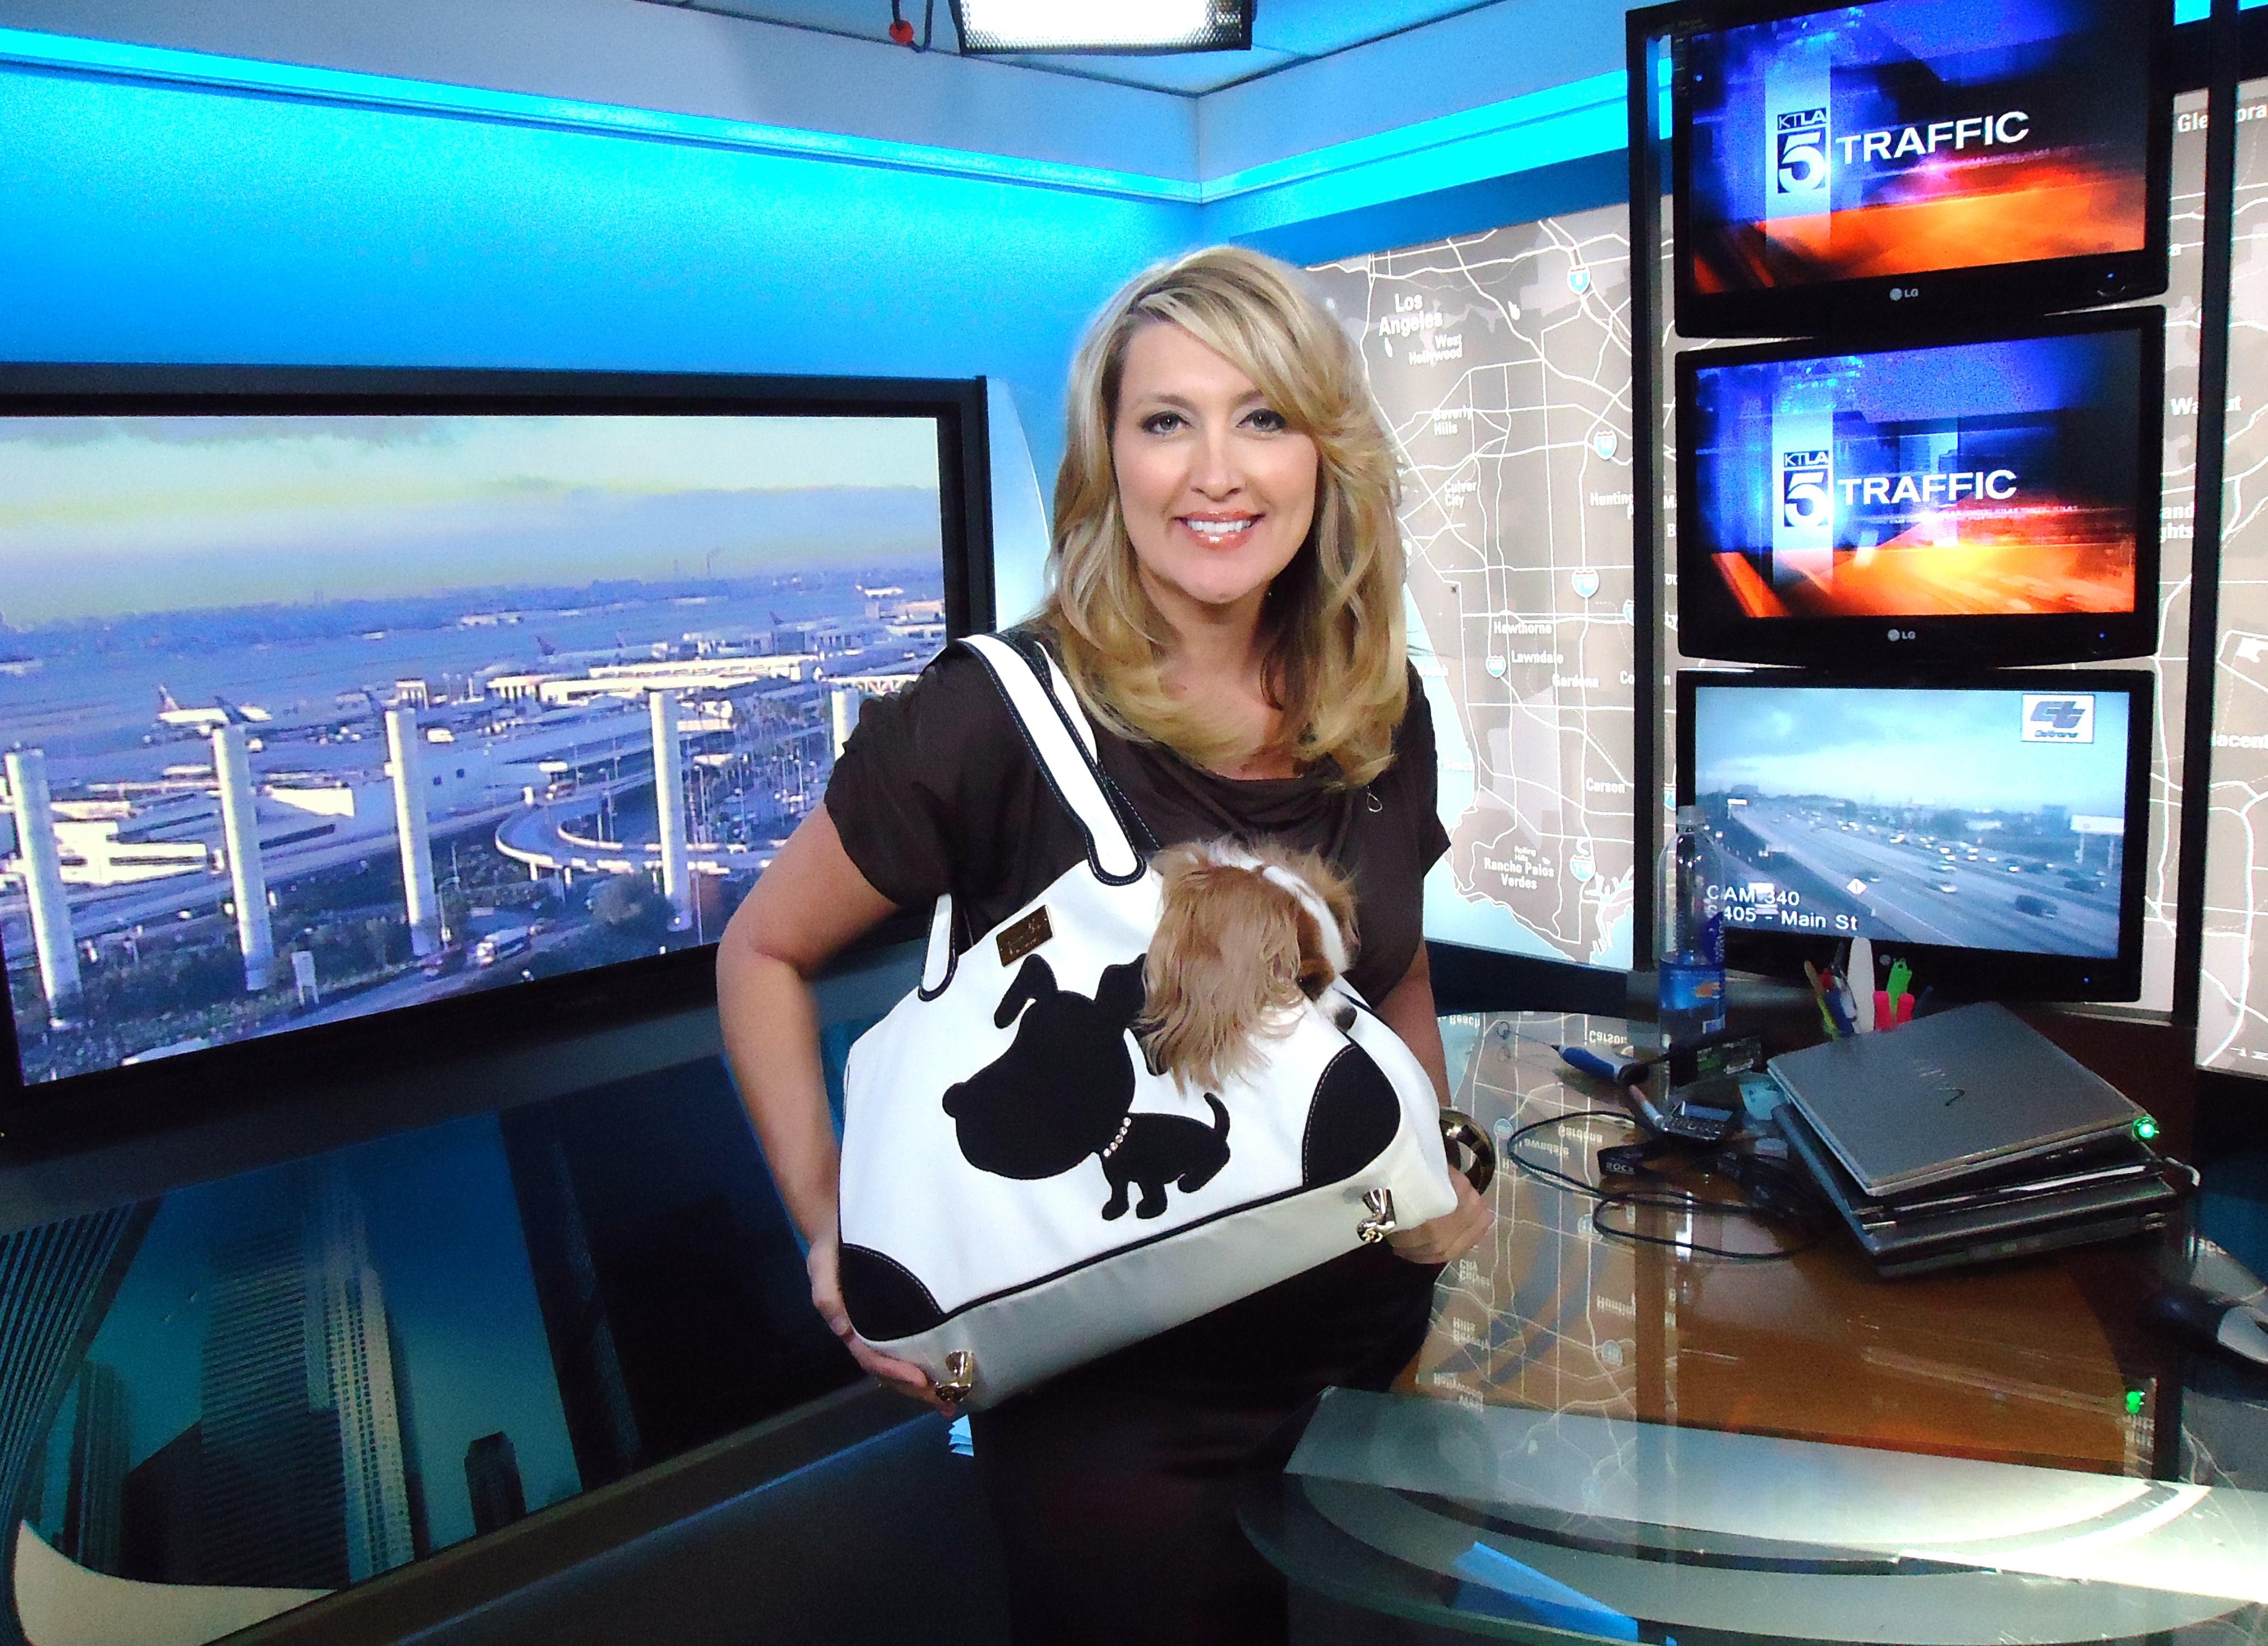 Wendy Burch Emmy award winning News Anchor